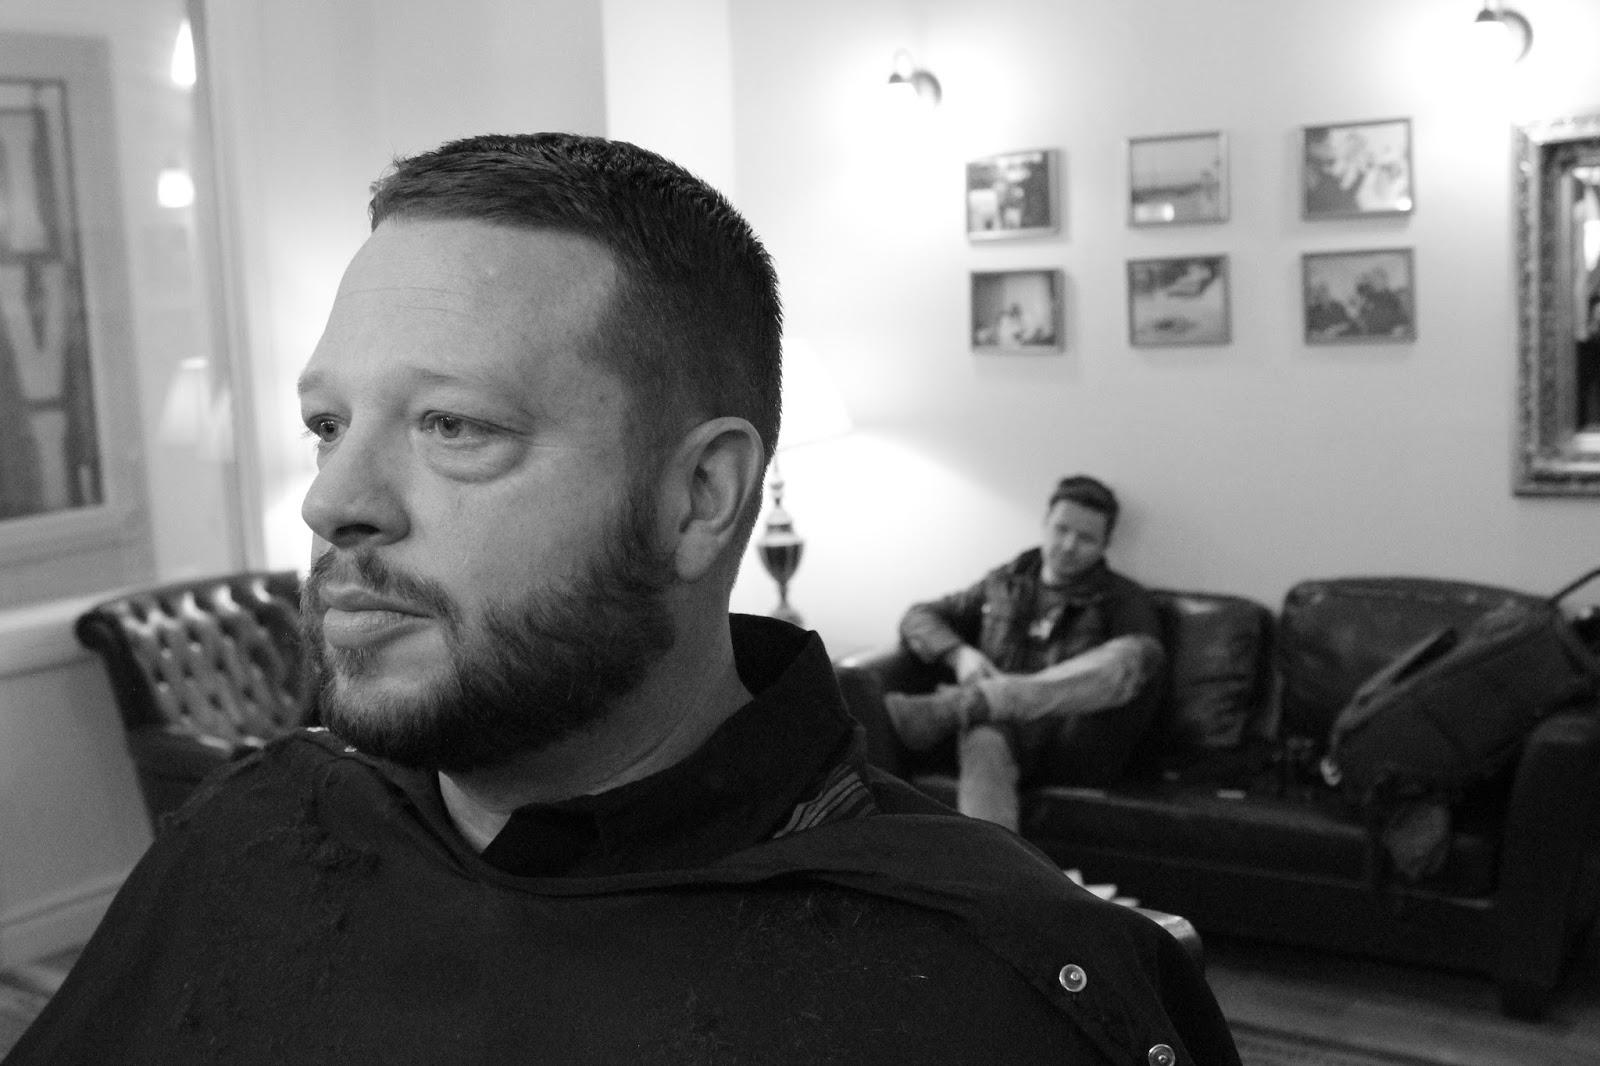 Danburry Barber Shop: January 2017